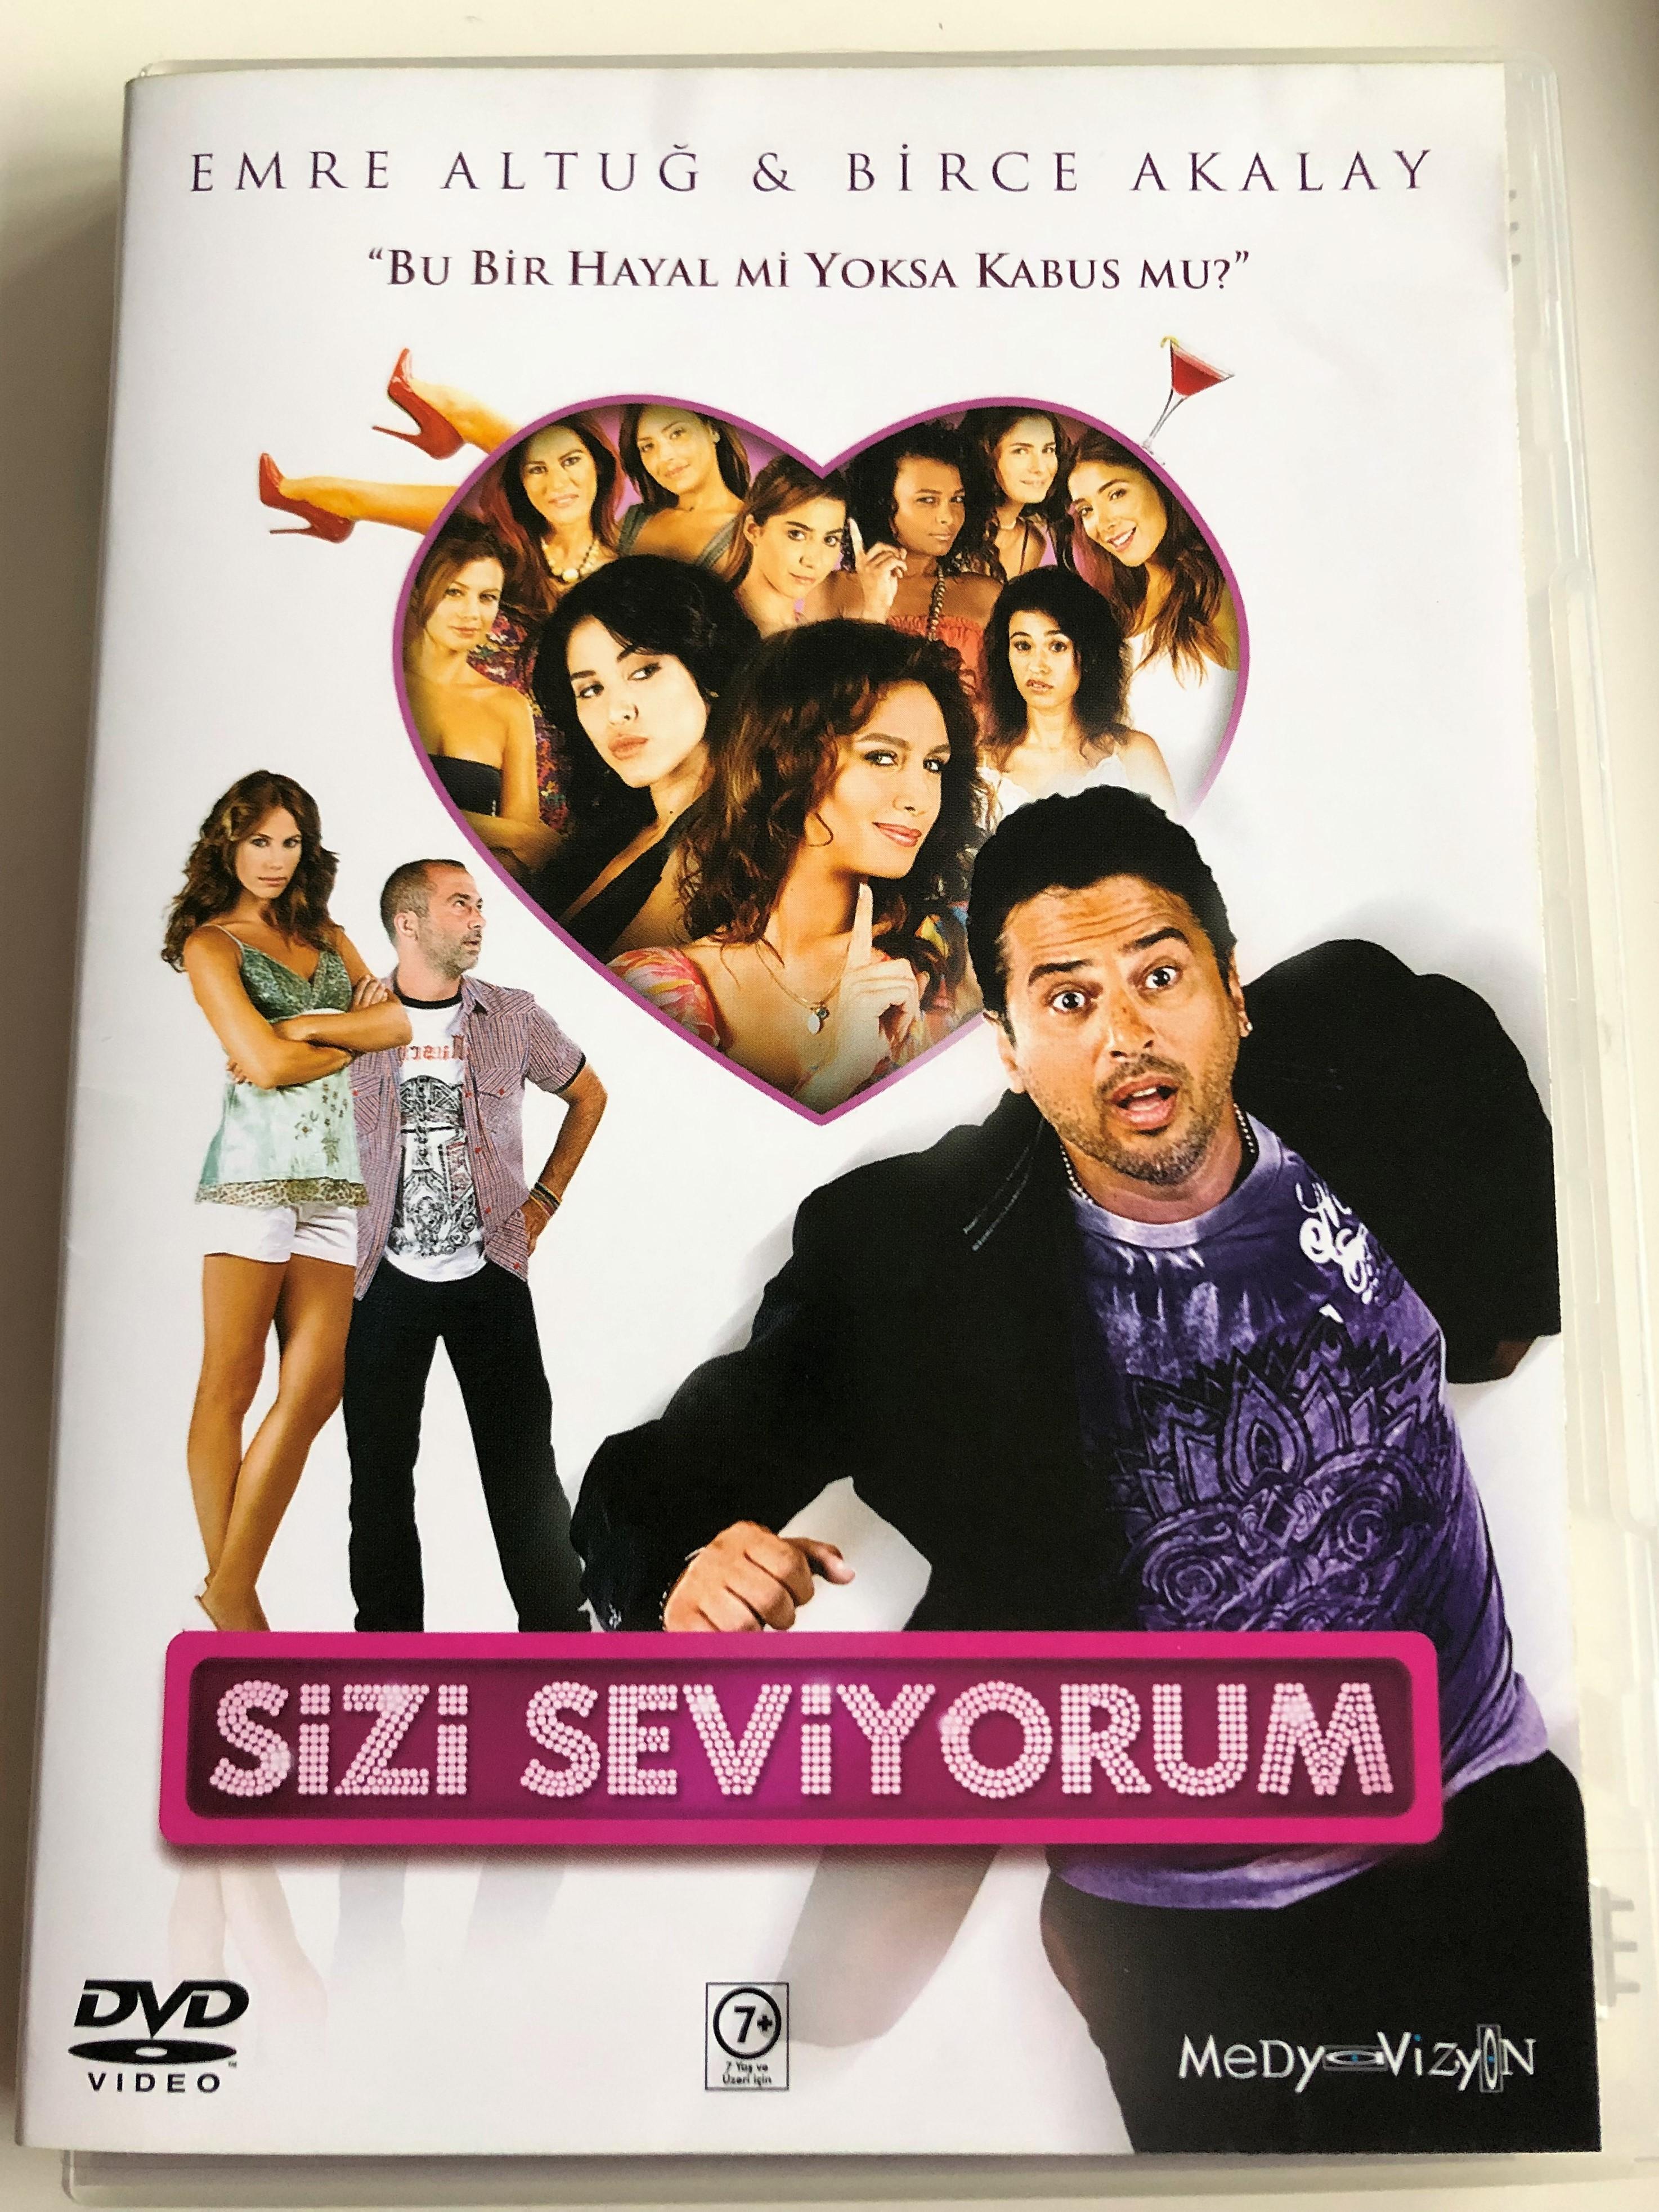 sizi-seviyorum-dvd-2009-directed-by-mustafa-u-ur-ya-c-o-lu-starring-emre-altu-birce-akalay-1-.jpg